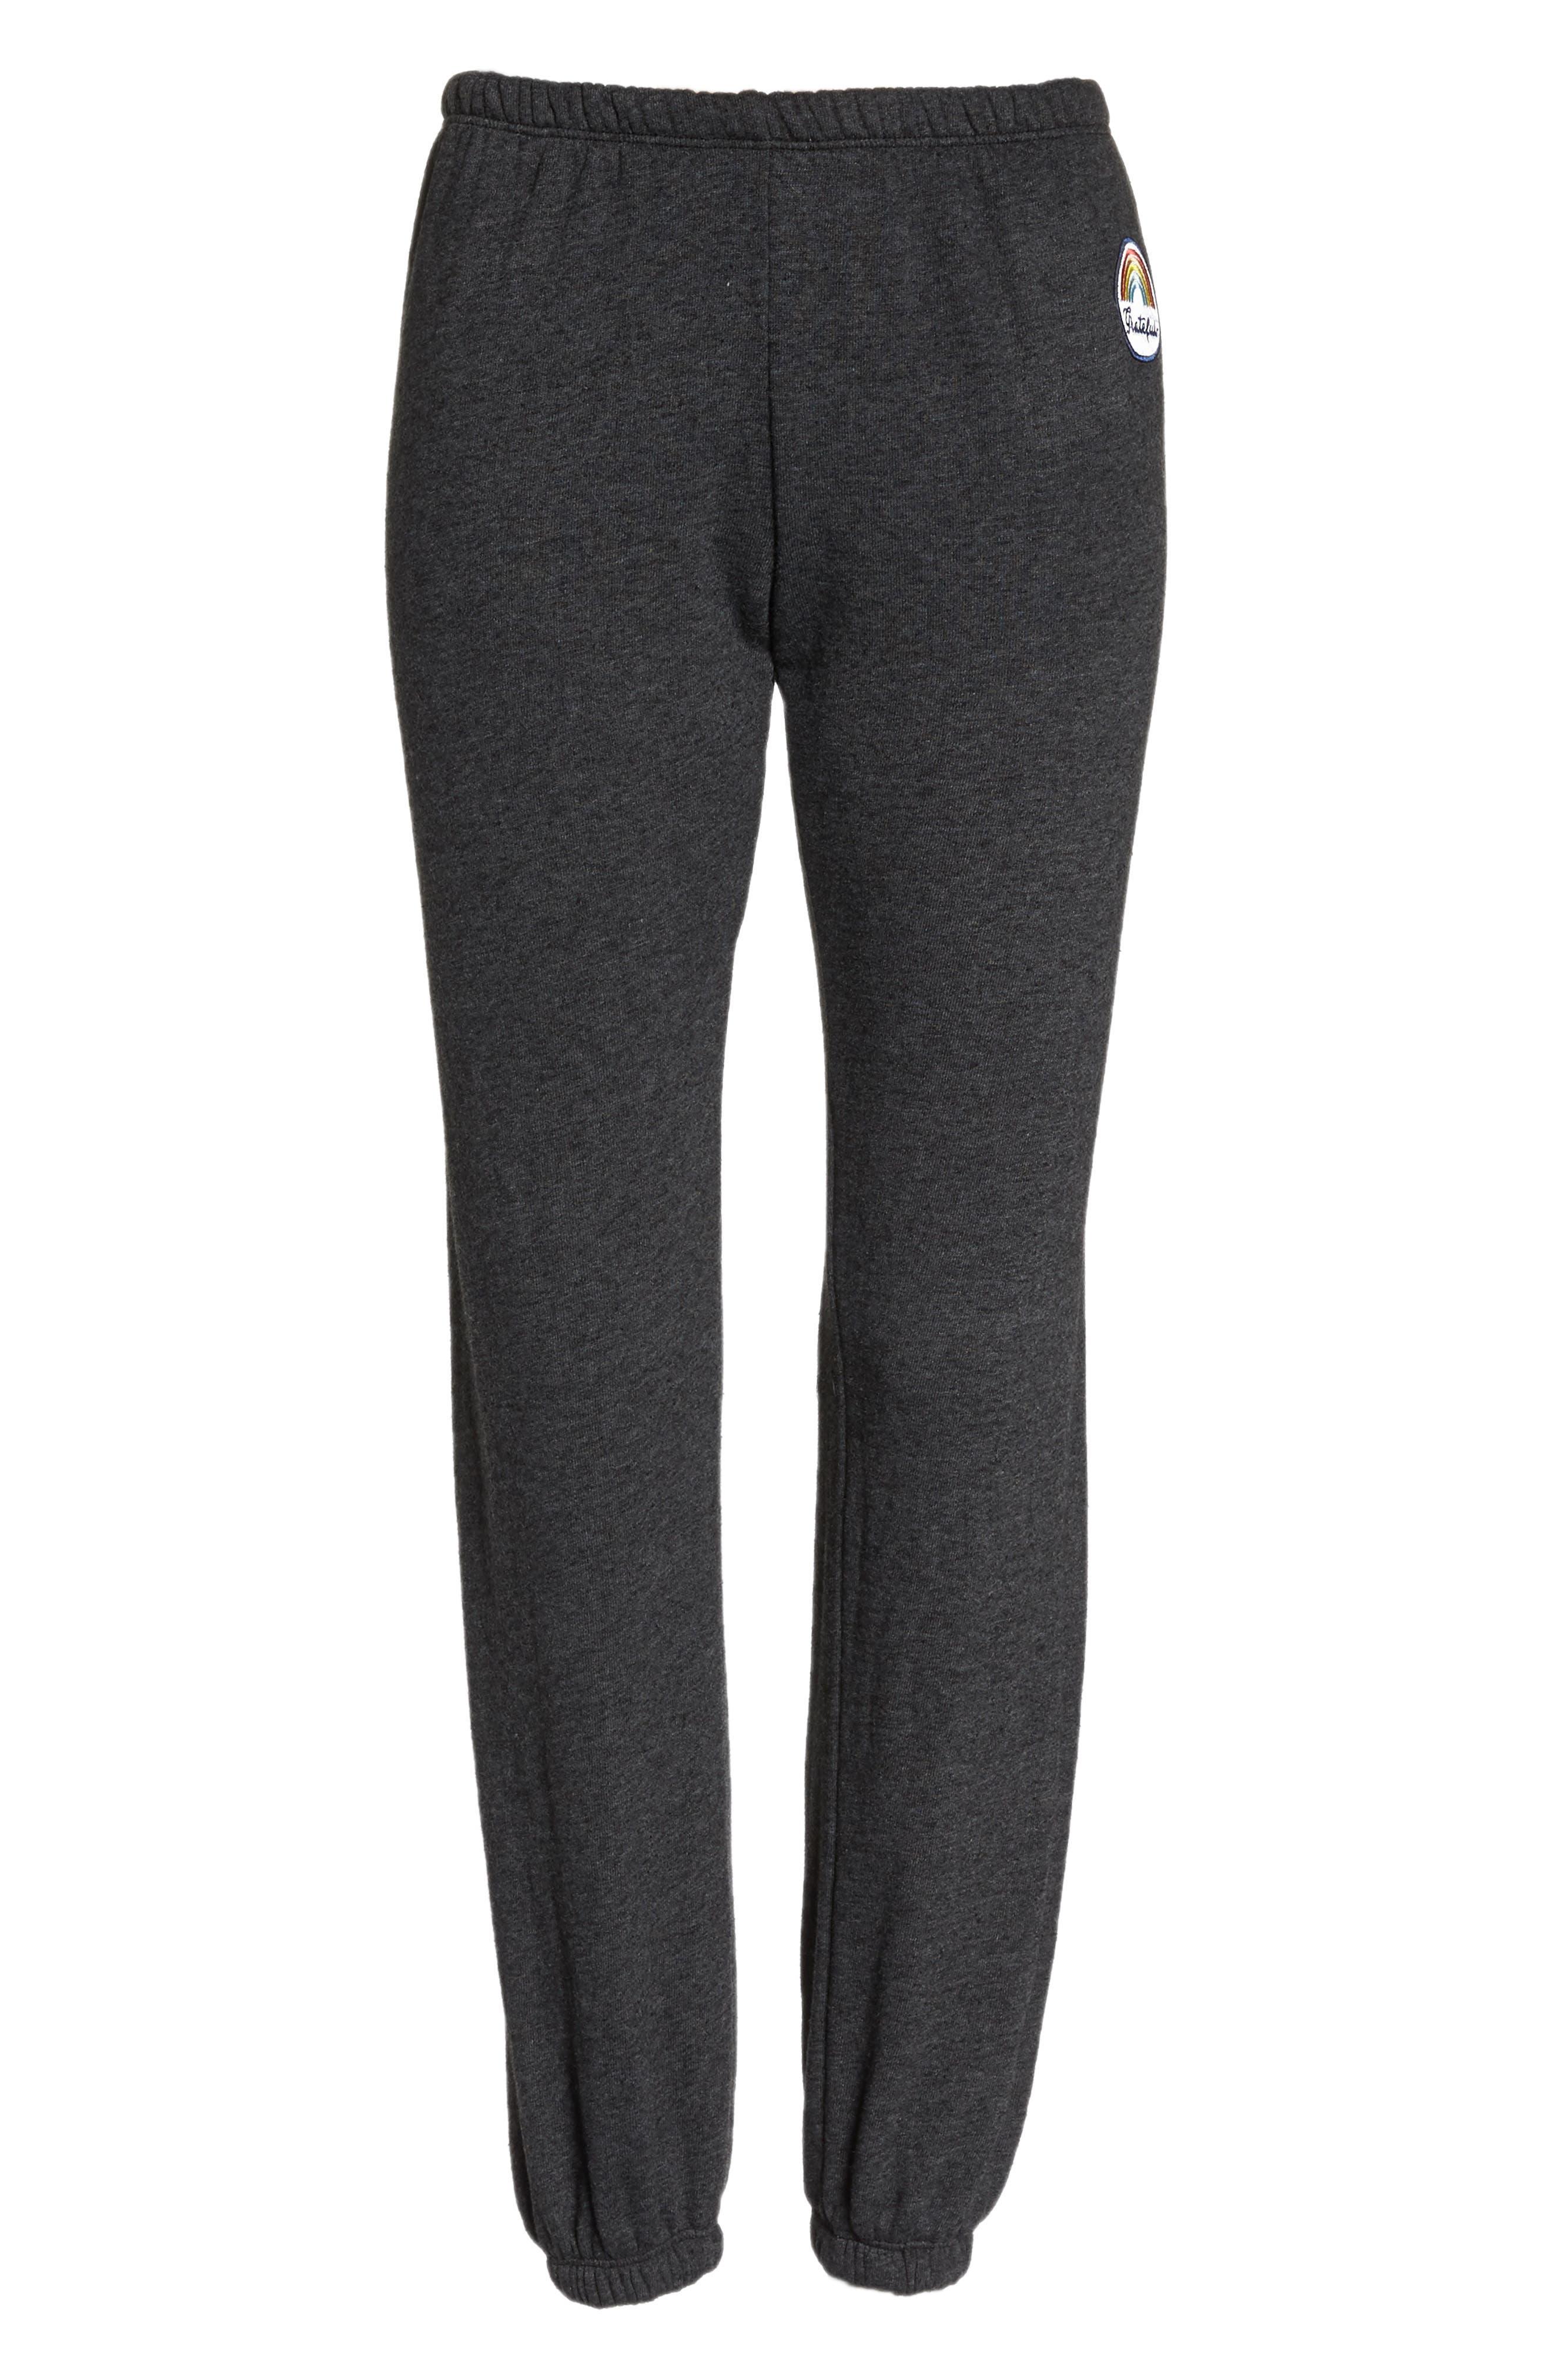 Grateful Perfect Knit Pants,                             Alternate thumbnail 7, color,                             009